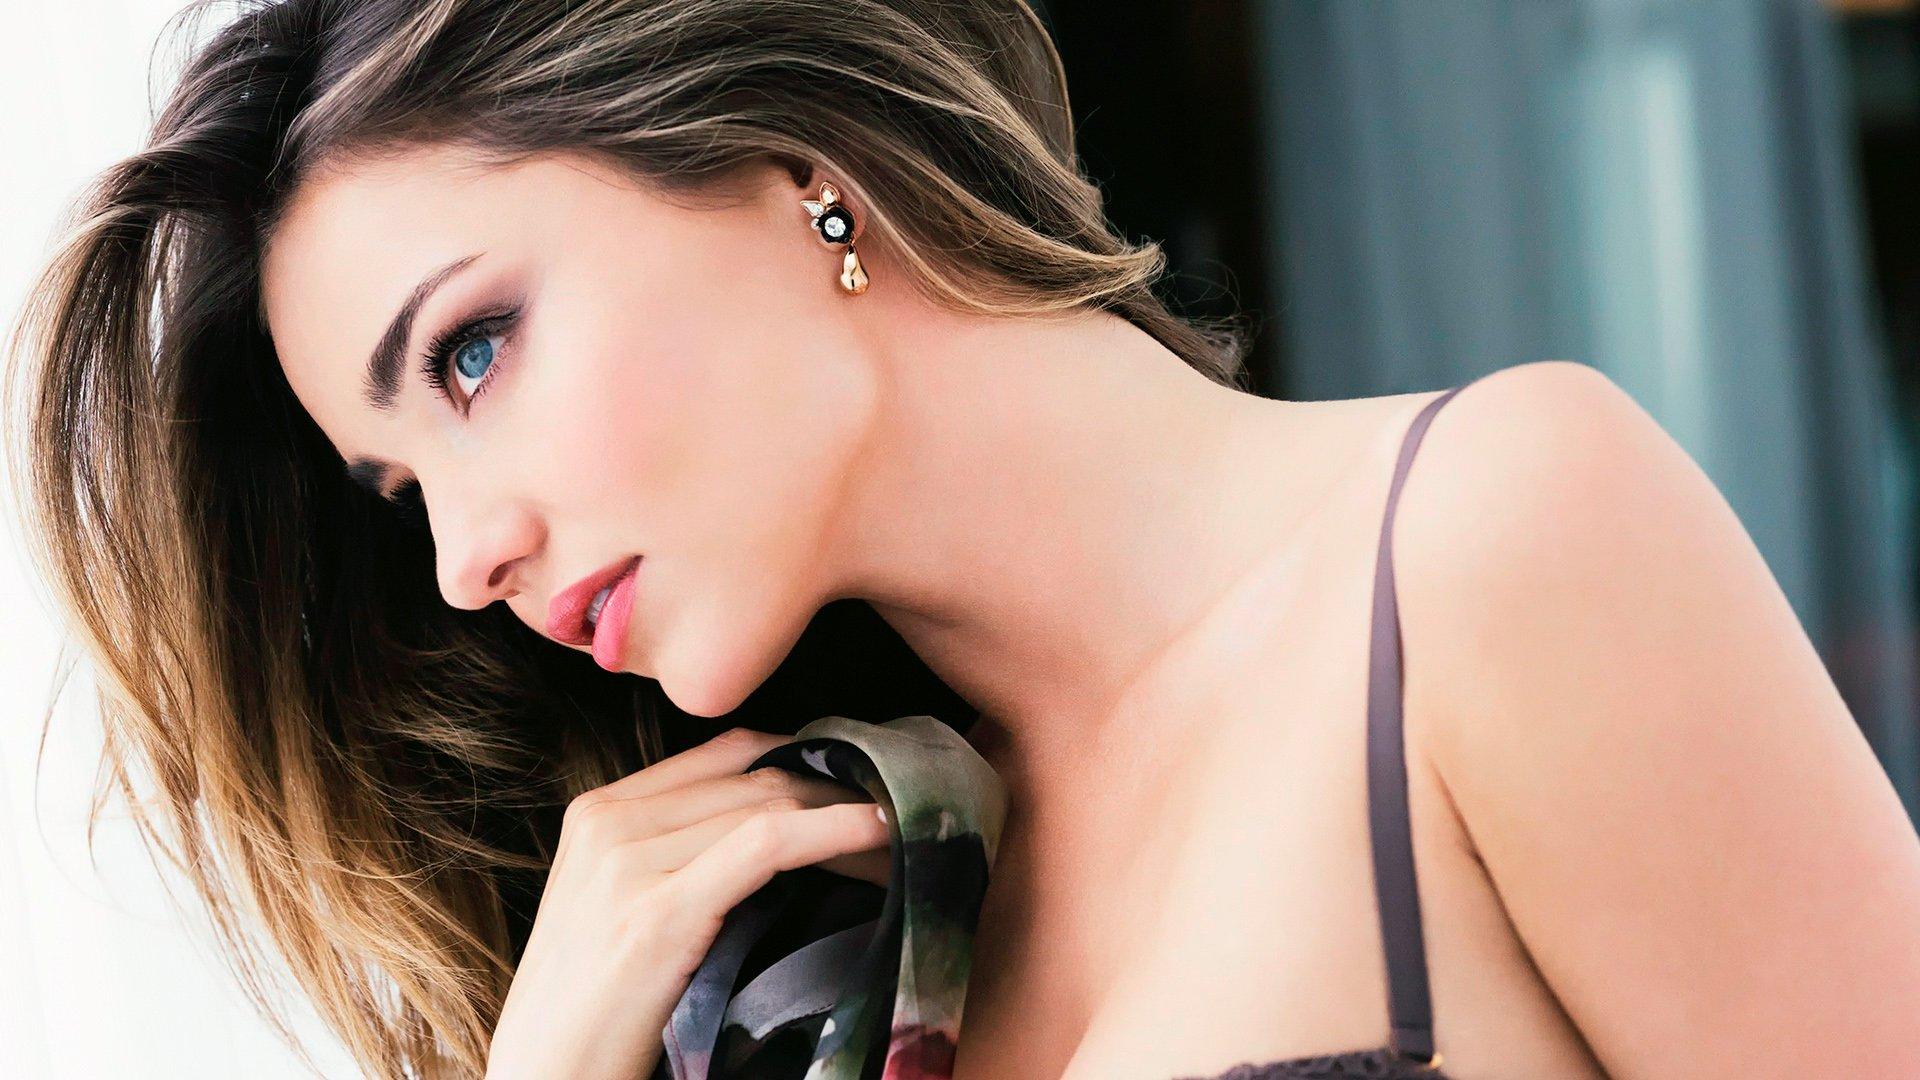 filmi-posle-foto-supermodeli-penthaus-eroticheskoe-domashnee